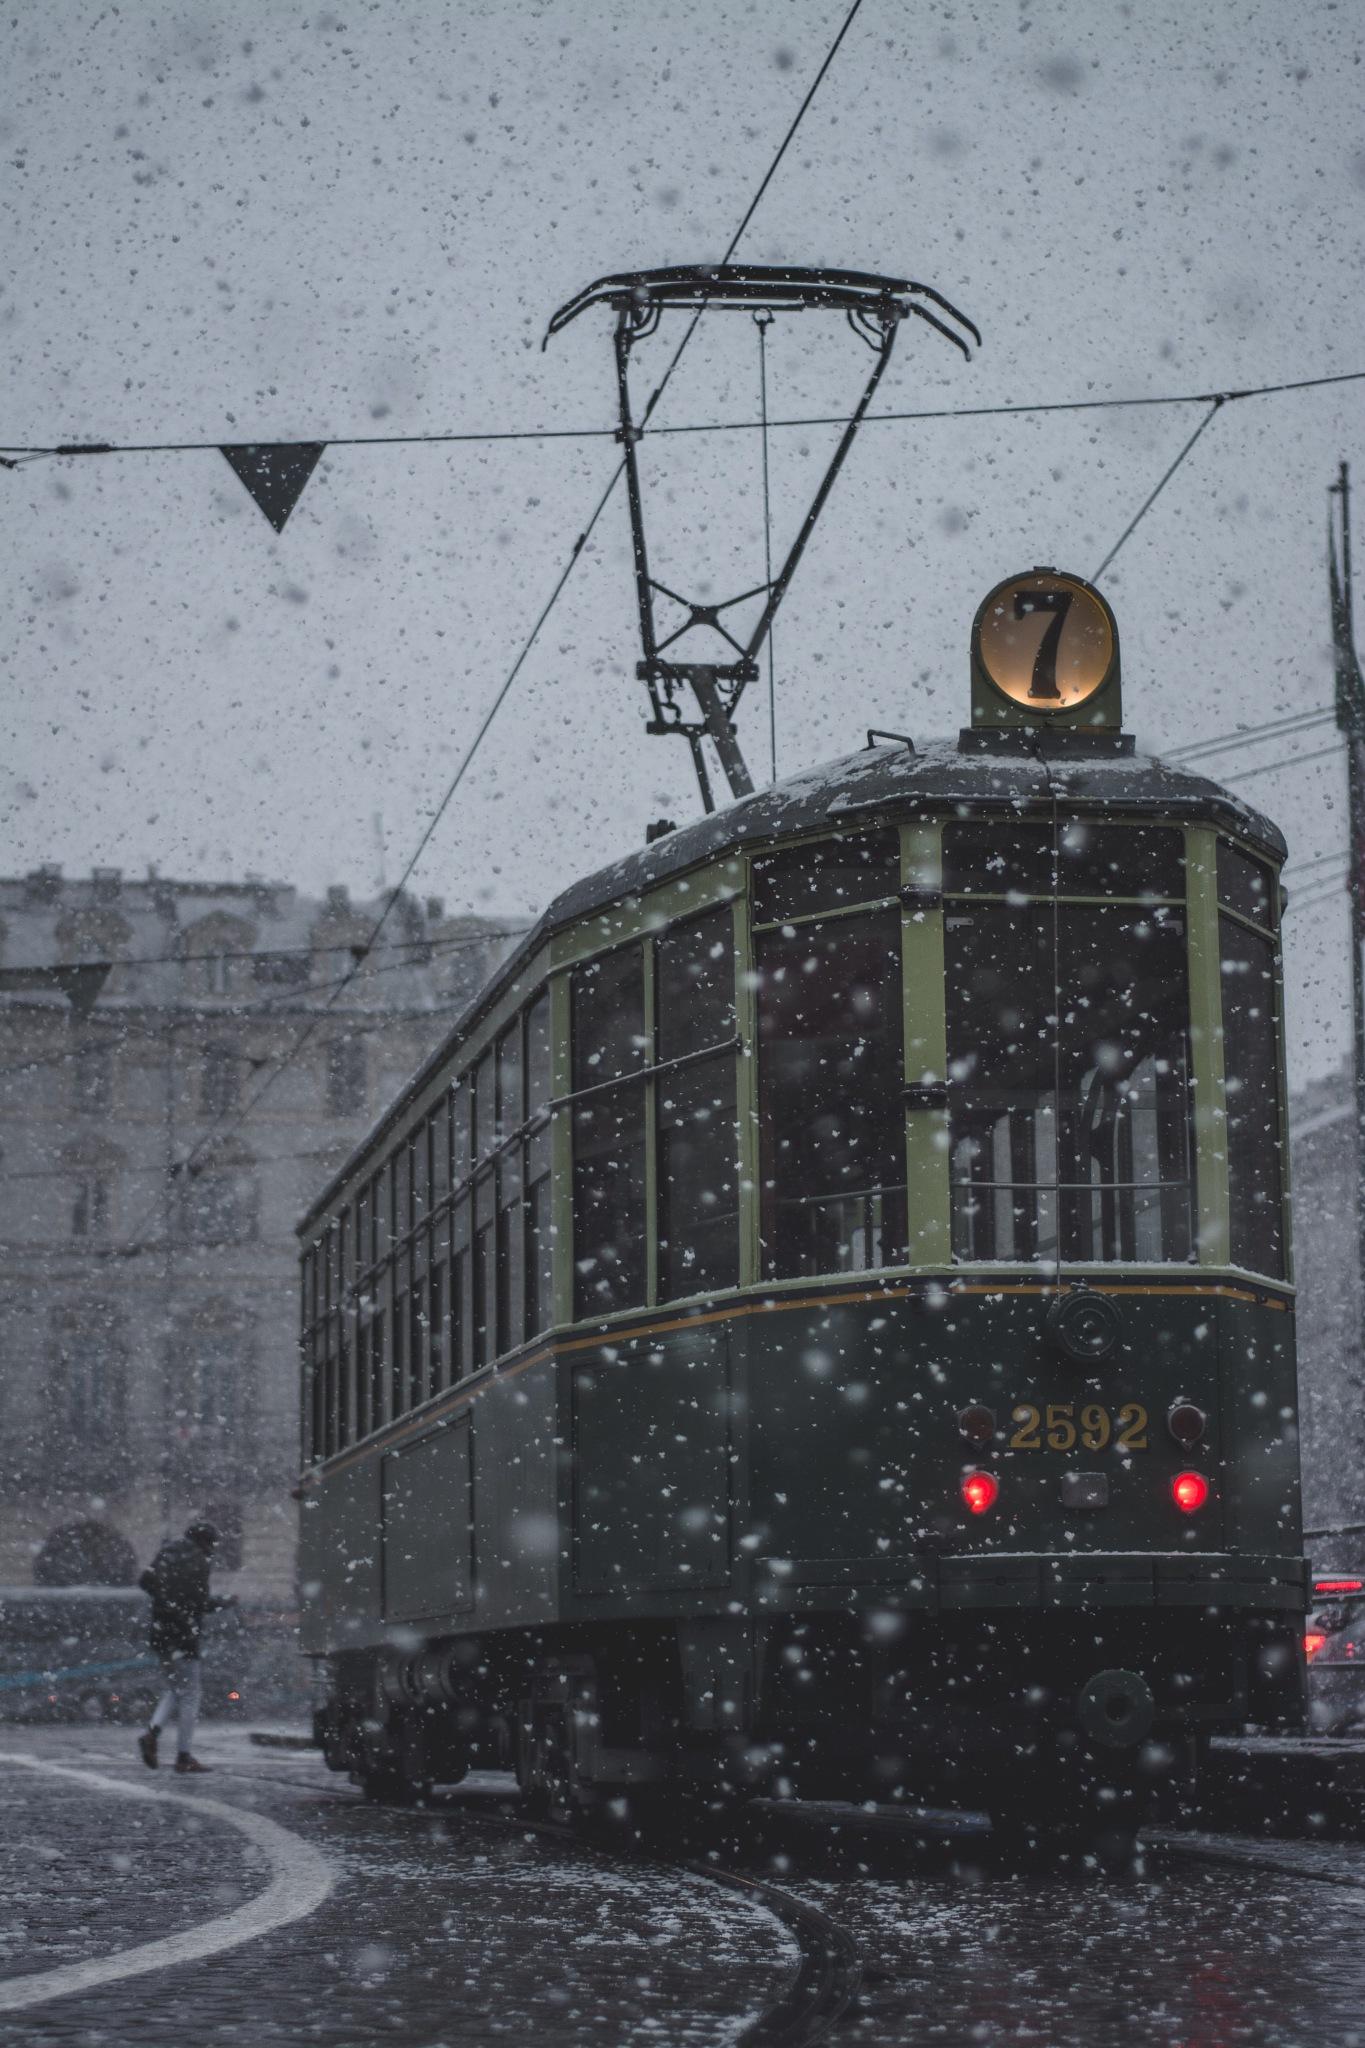 Tram in a snow storm by Gabriele Peretti